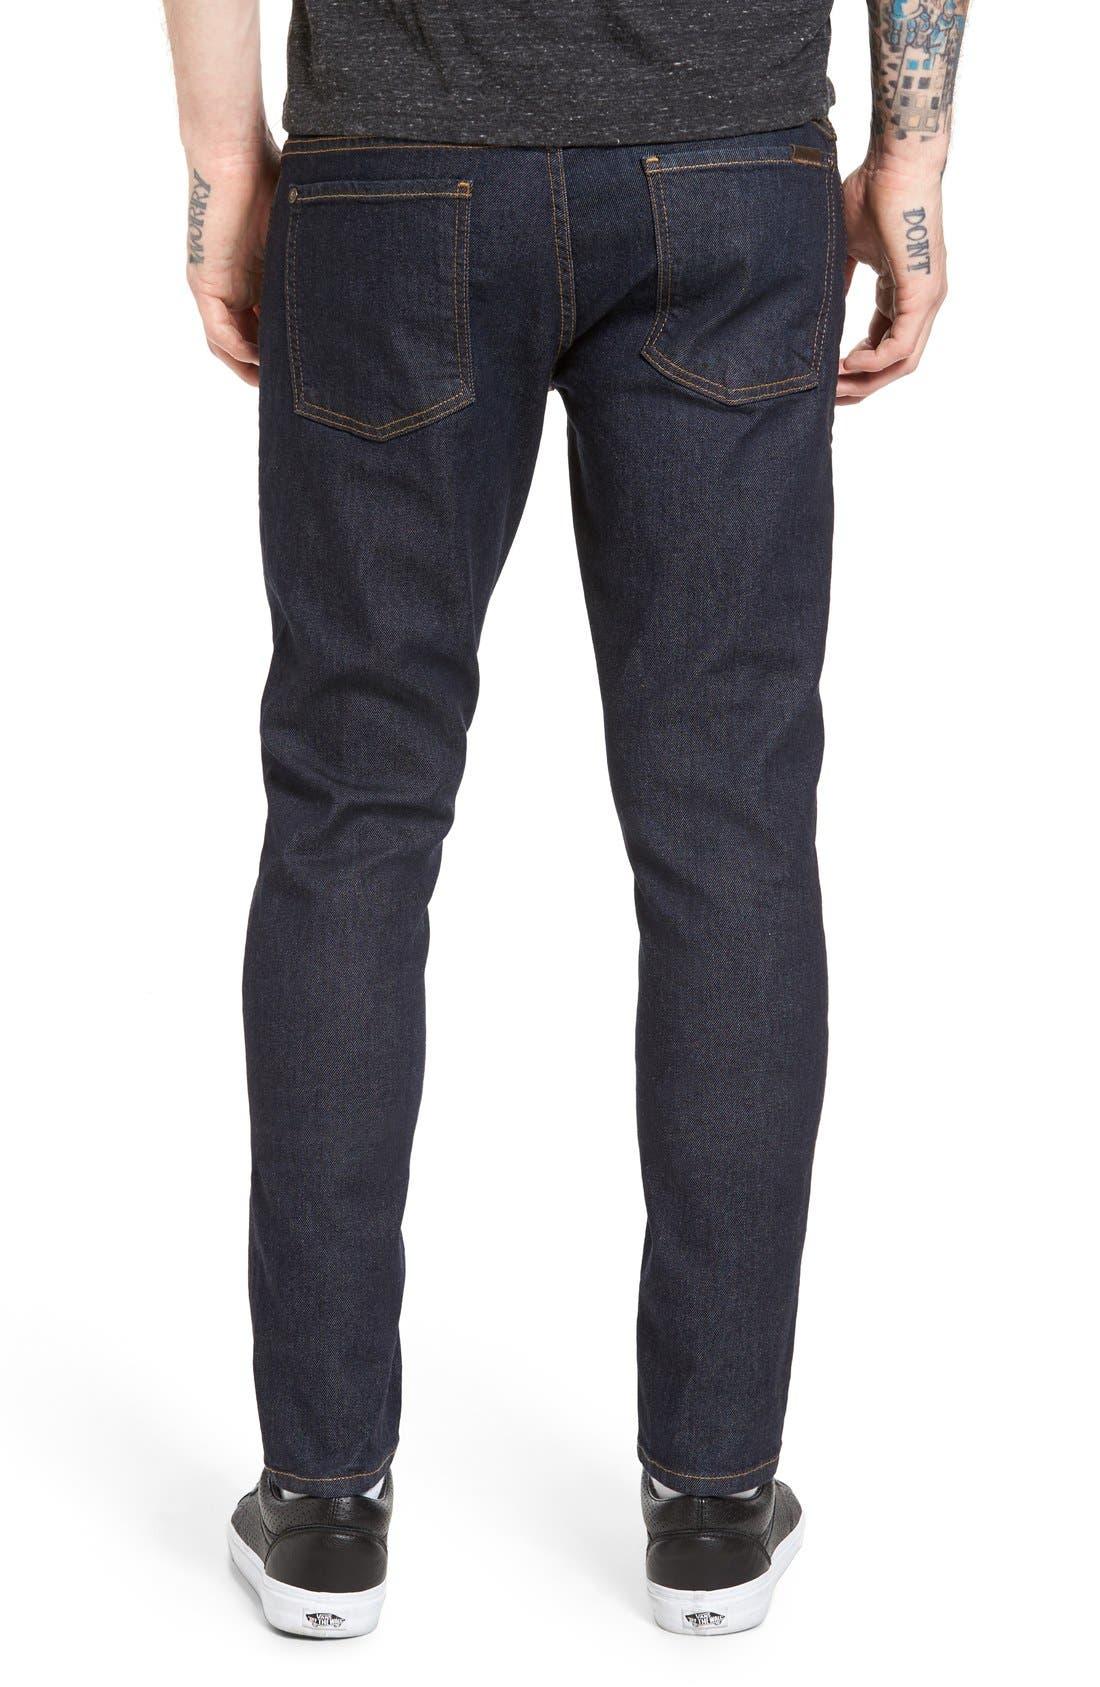 Vantage Skinny Fit Jeans,                             Alternate thumbnail 8, color,